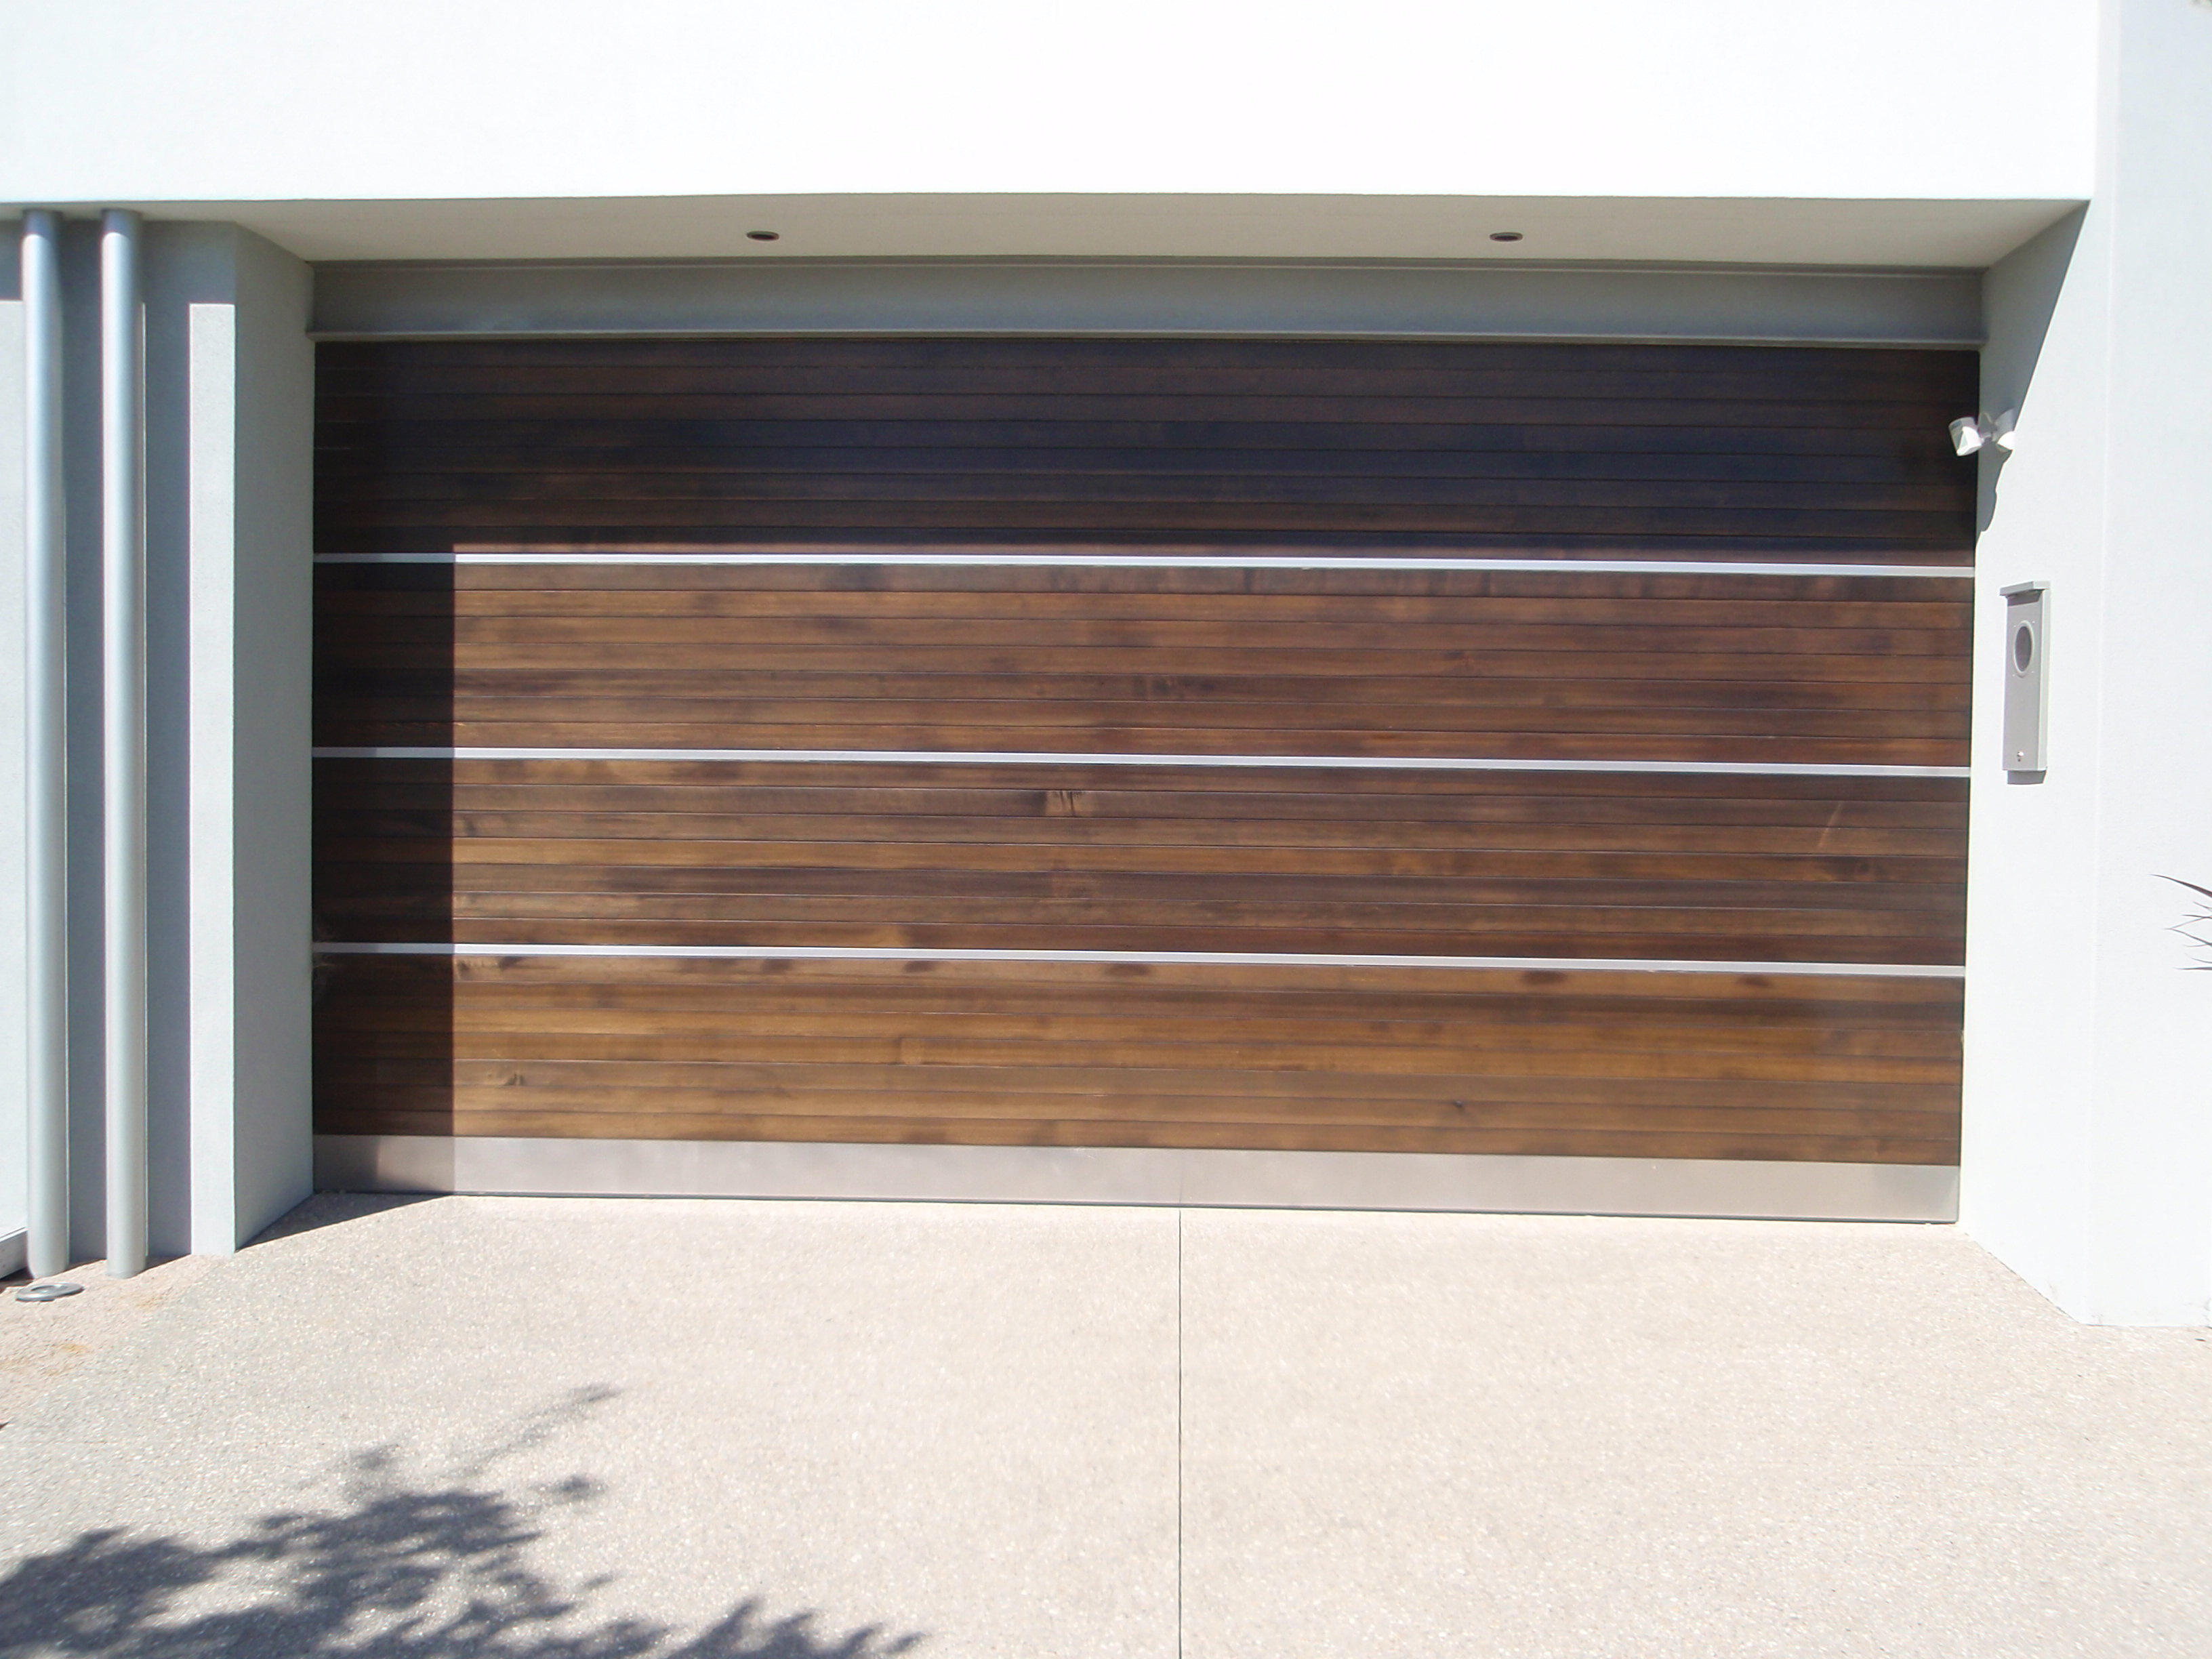 2448 #81604A ALI STRIP & W.R.C. West Coast Garage Doors picture/photo Specialty Garage Doors 36893264